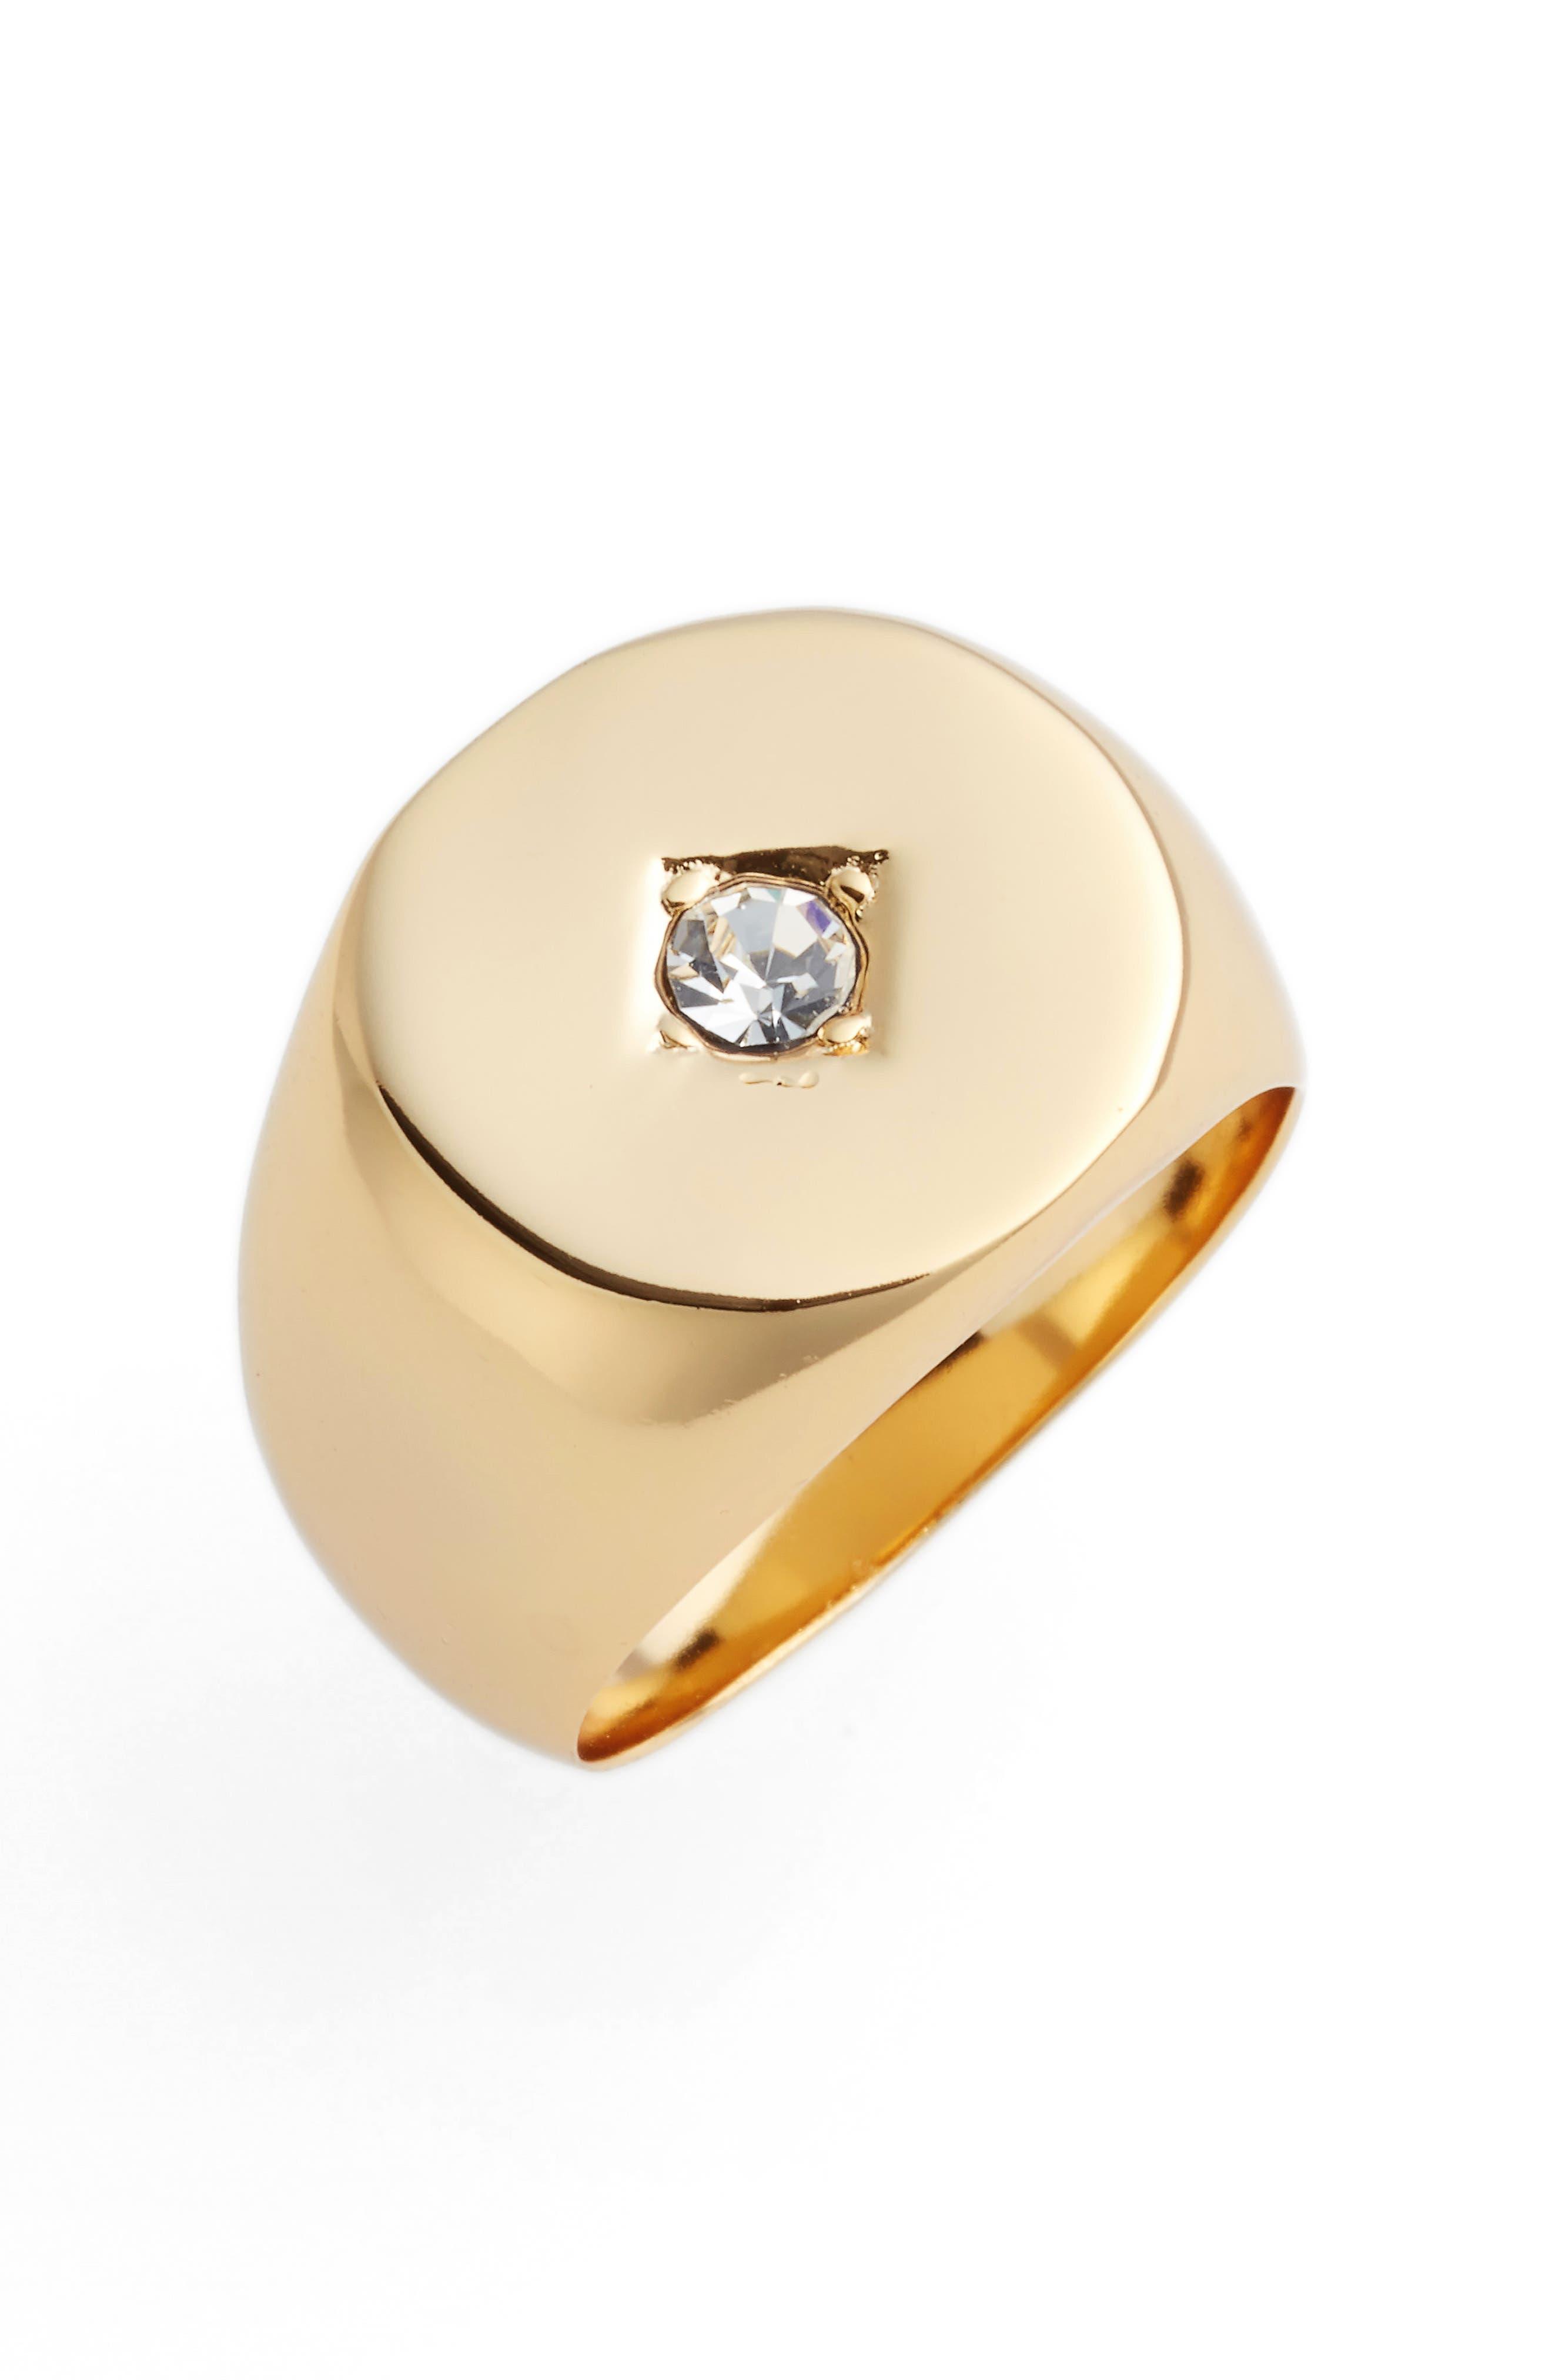 Main Image - Jules Smith Tulum Signet Ring